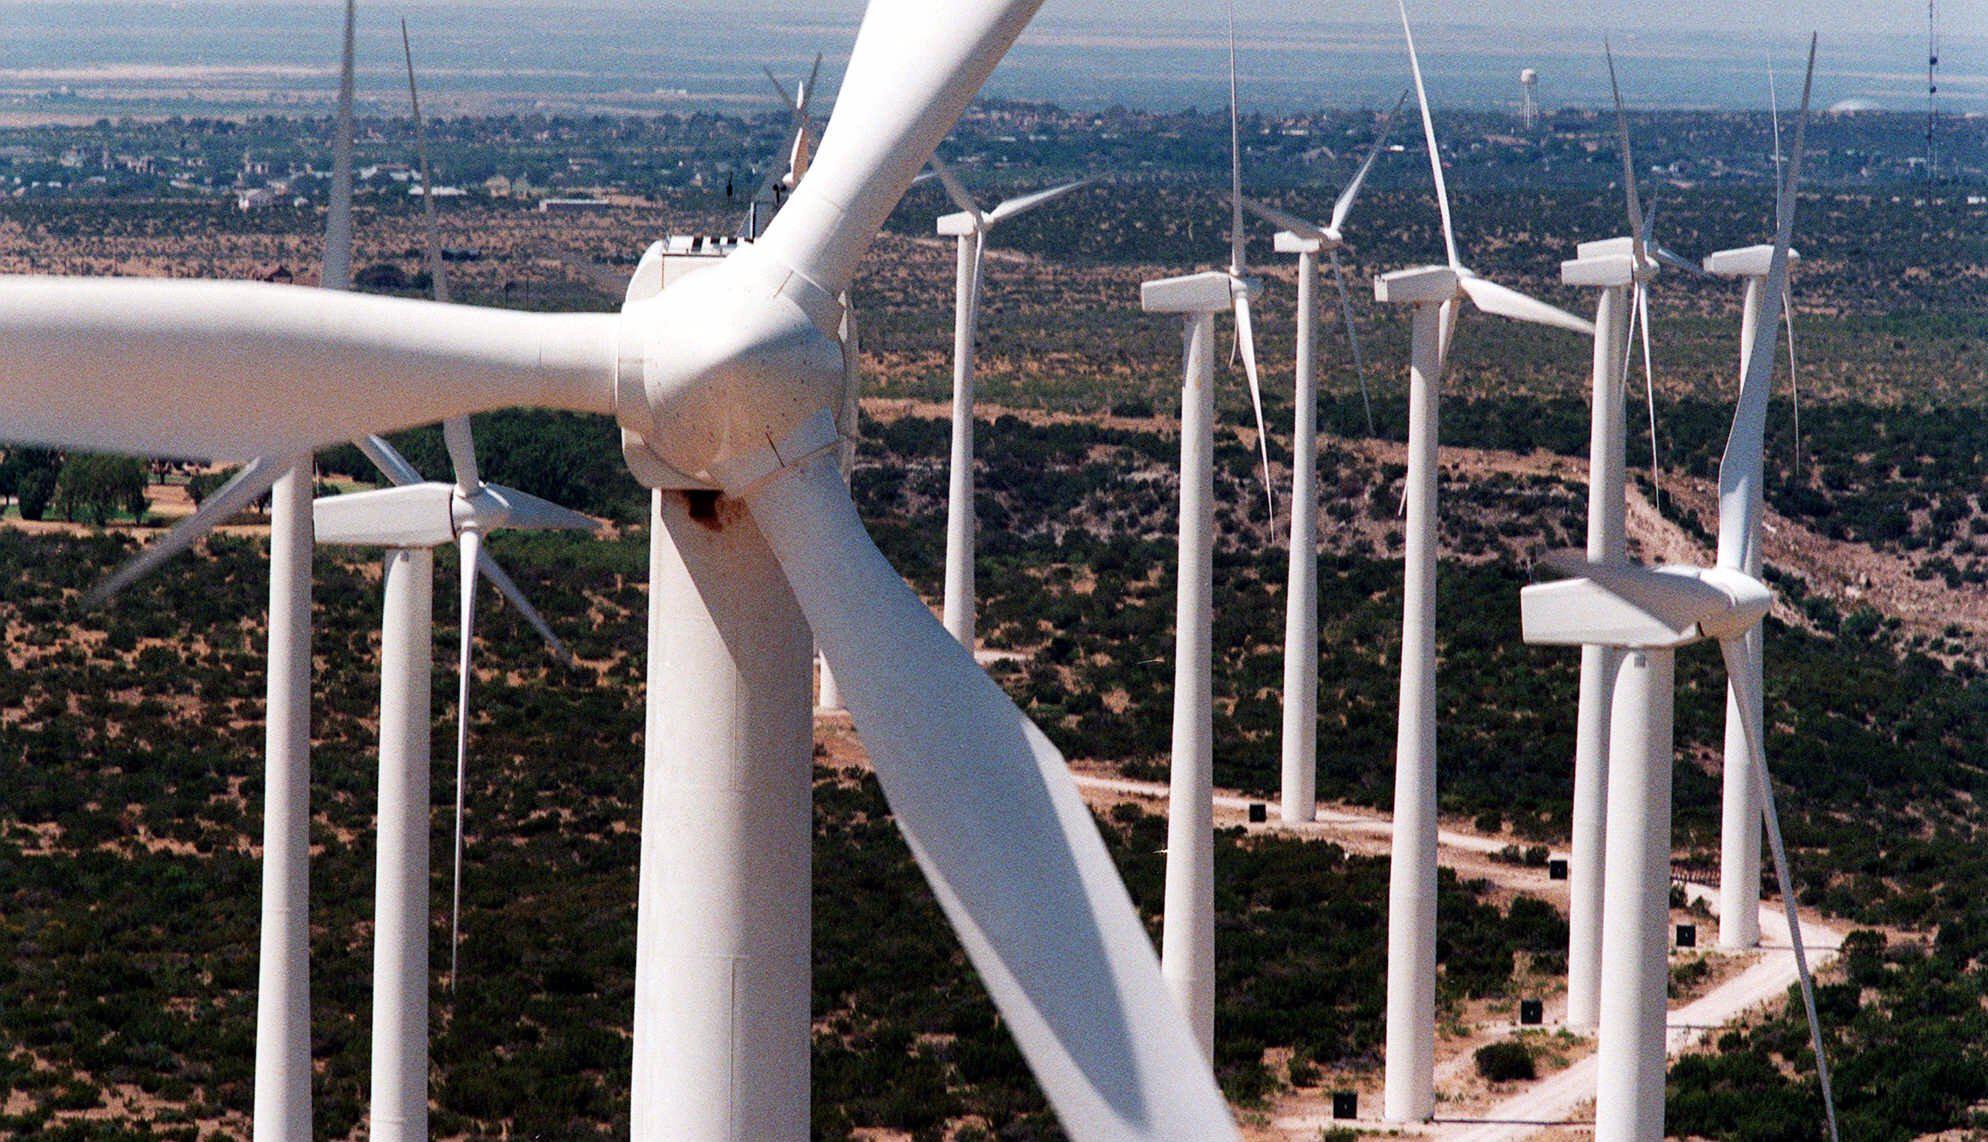 NRG executive cautions Senate on clean energy subsidies